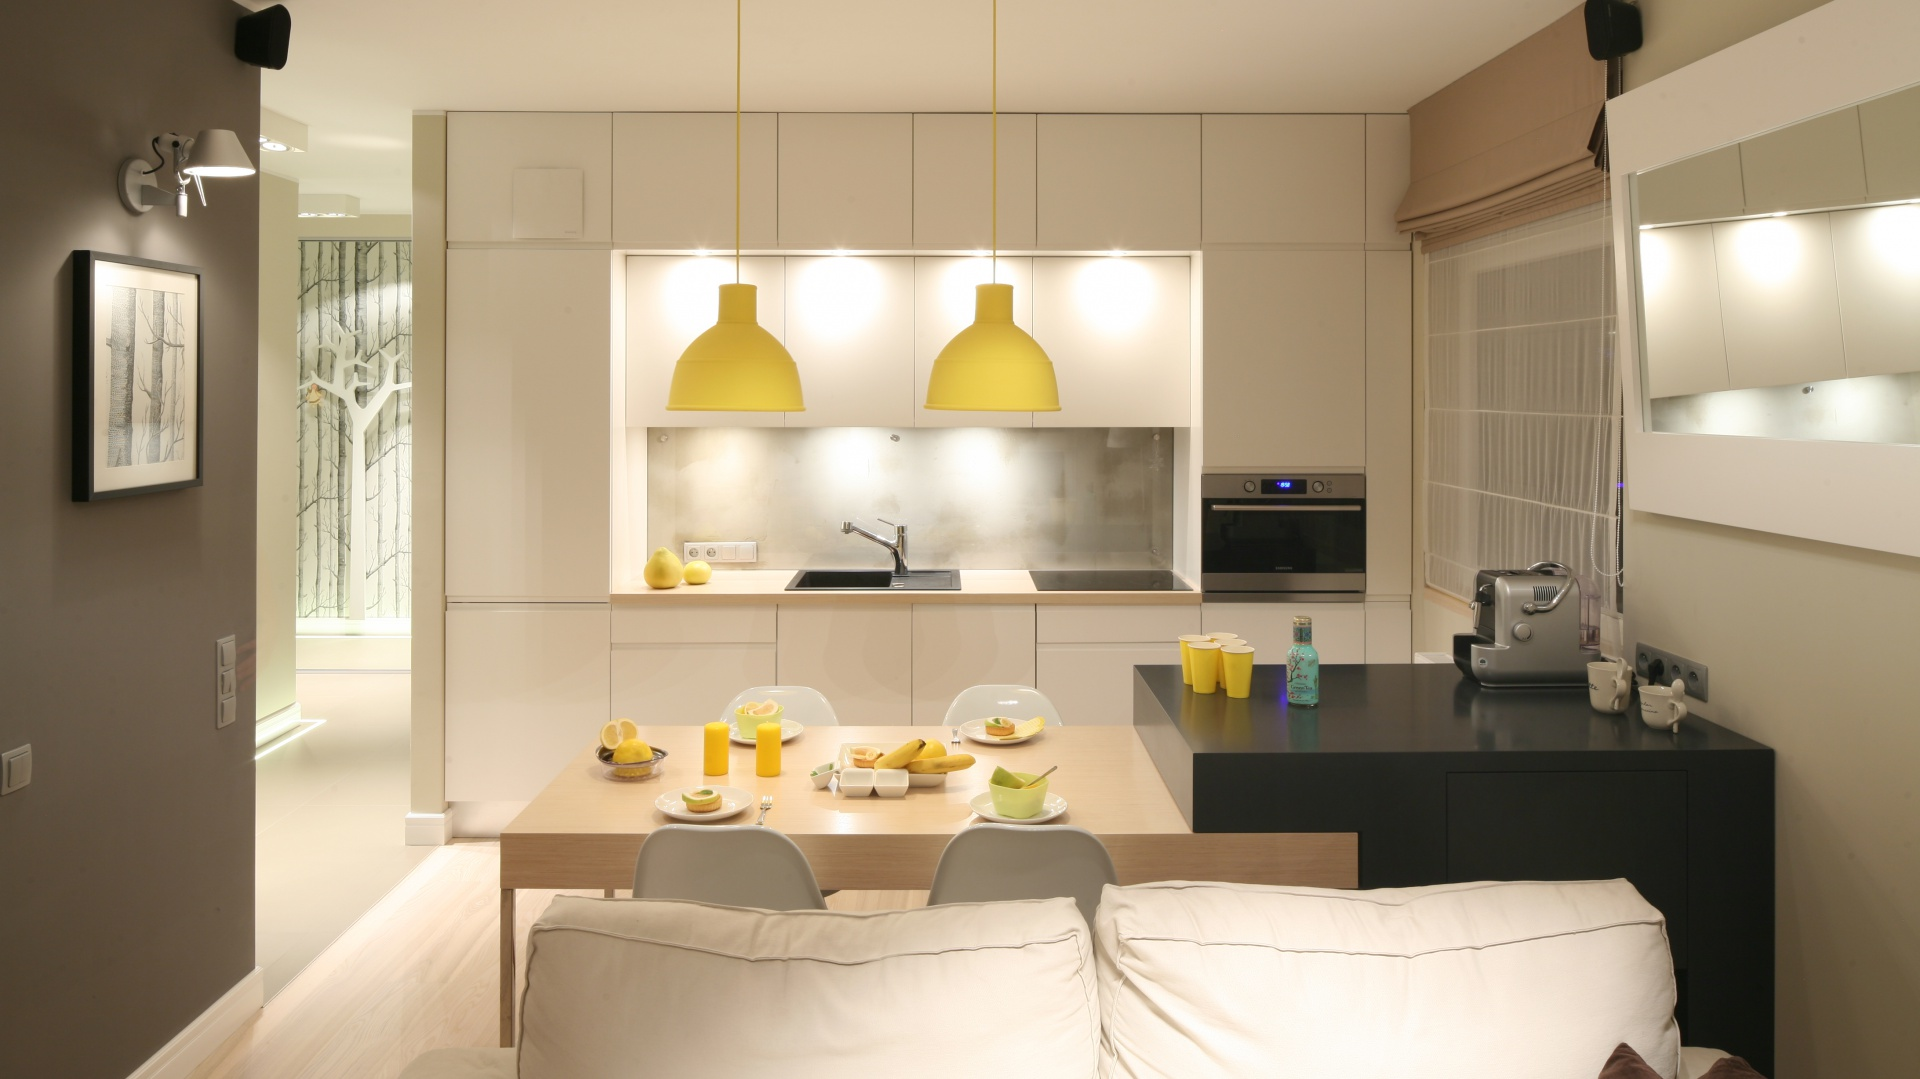 Kuchnia otwarta na salon to kuchnia otwarta na salon for Kuchnia z salonem aranzacje